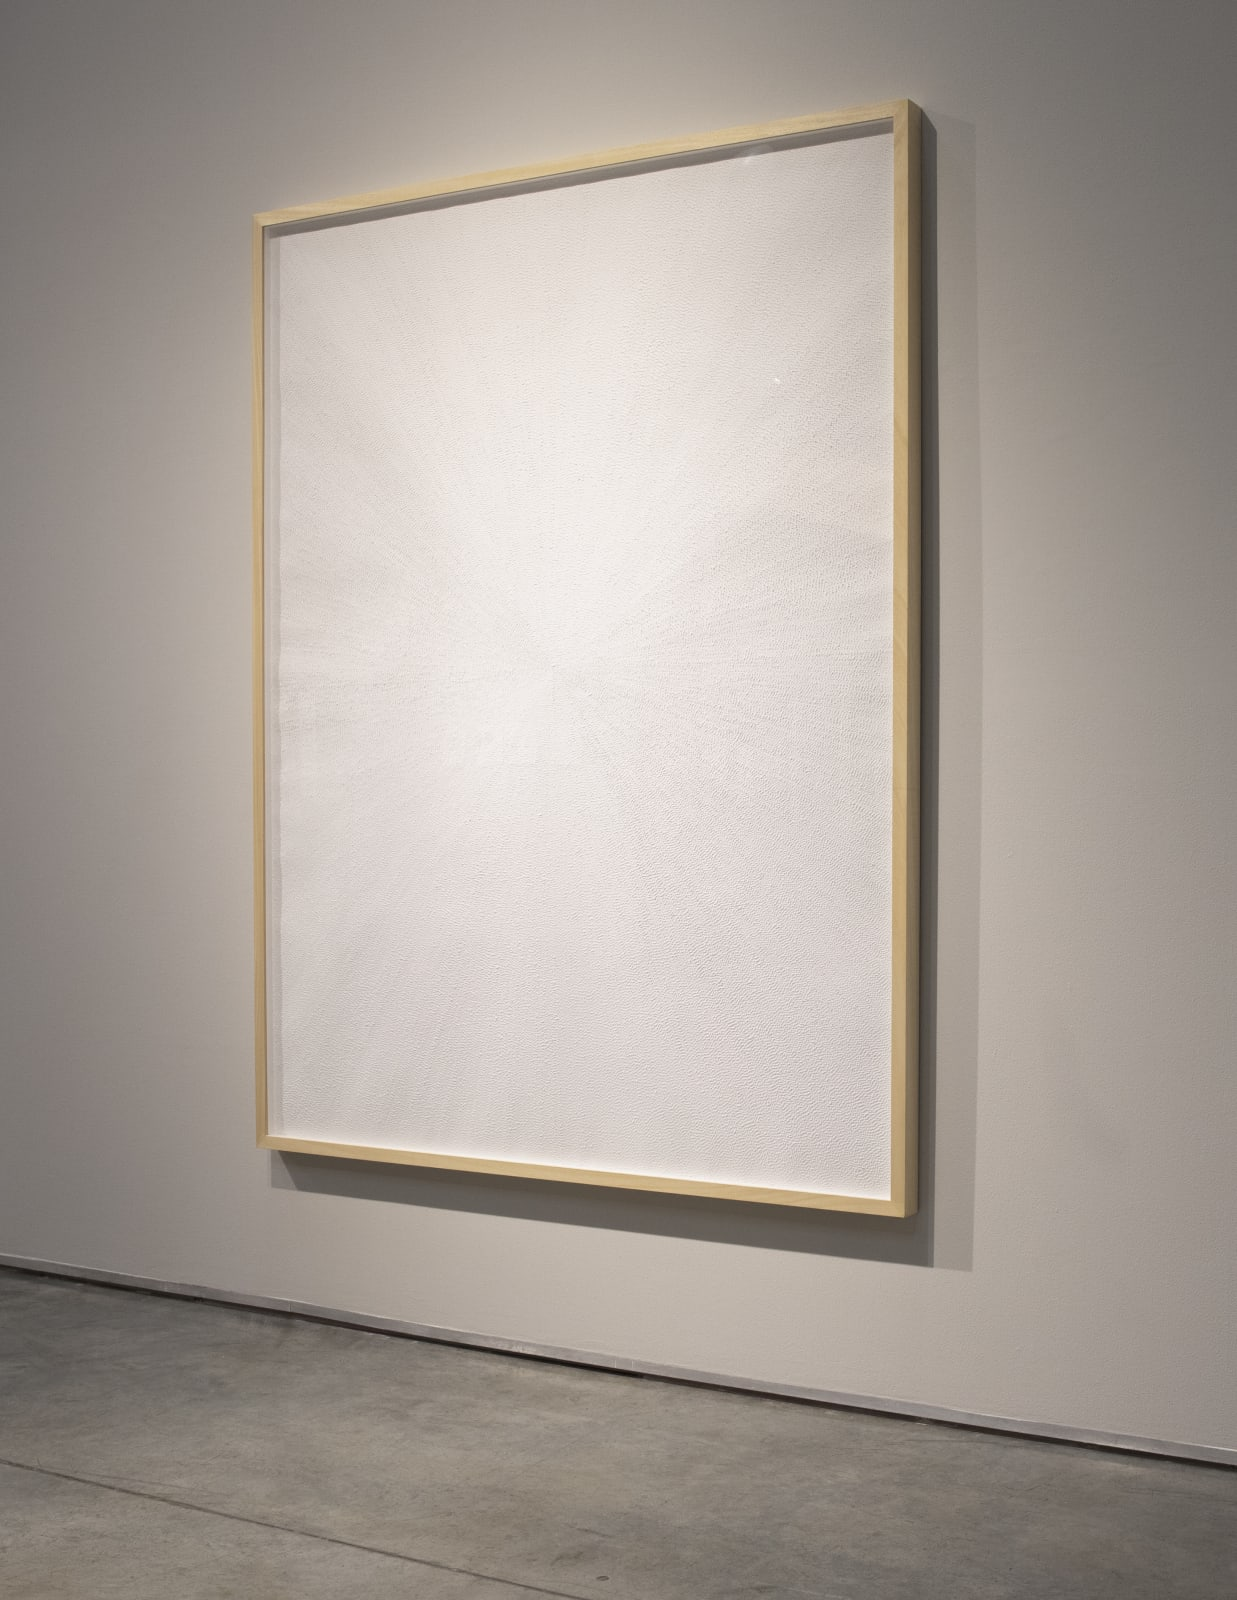 Mohammed Kazem, Collecting Light No.2, 2020